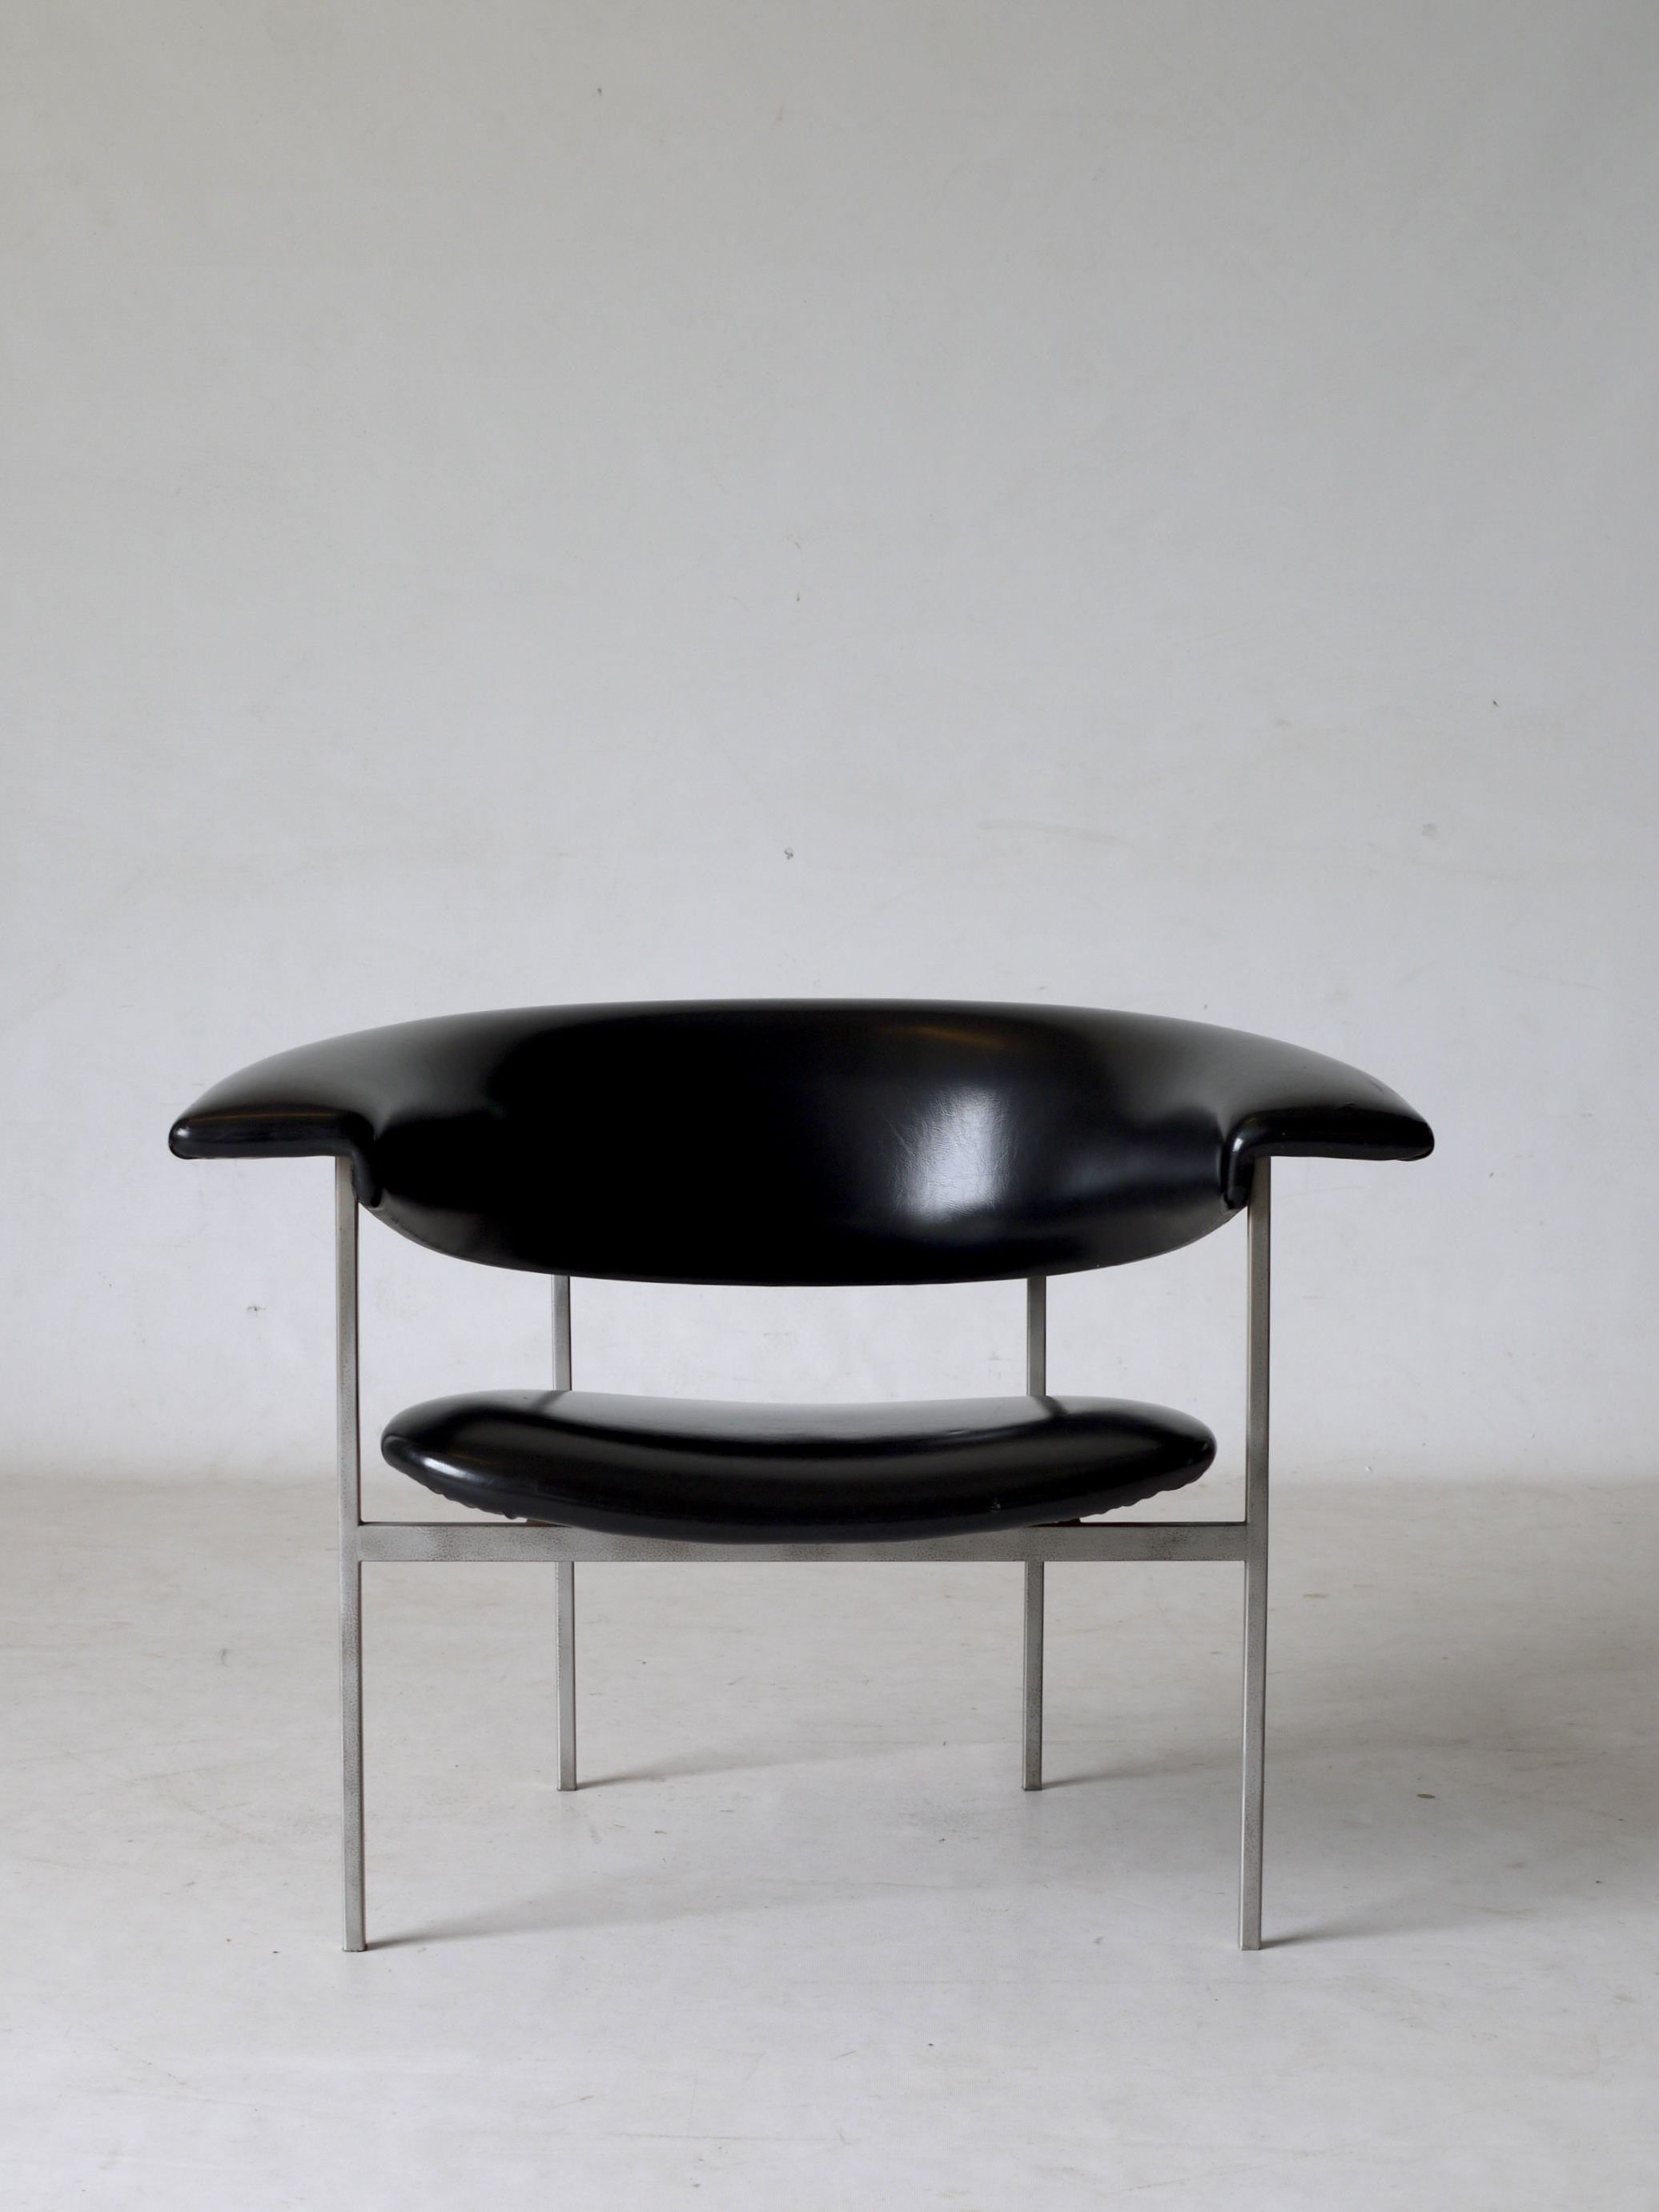 Gamma Eettafel Stoelen.Rudolf Wolf Gamma Chair S 1960s Meubels